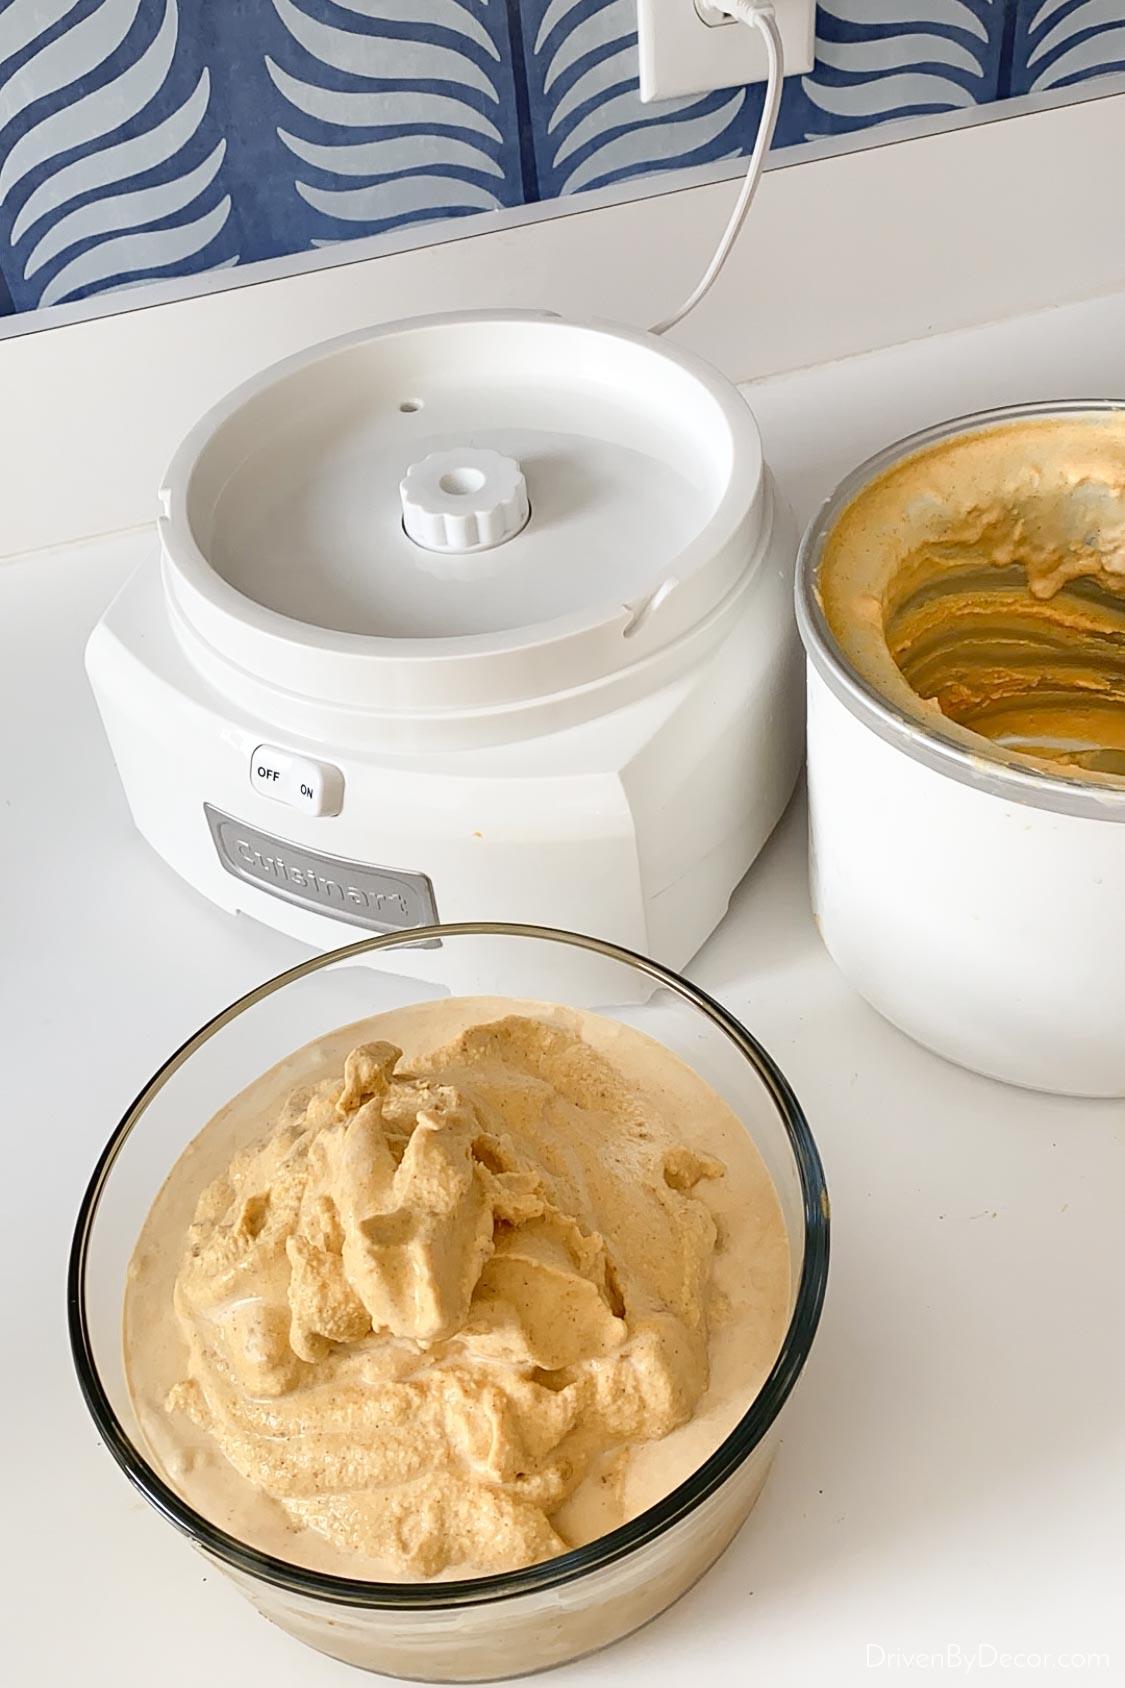 Ice cream made from my Cuisinart ice cream maker!